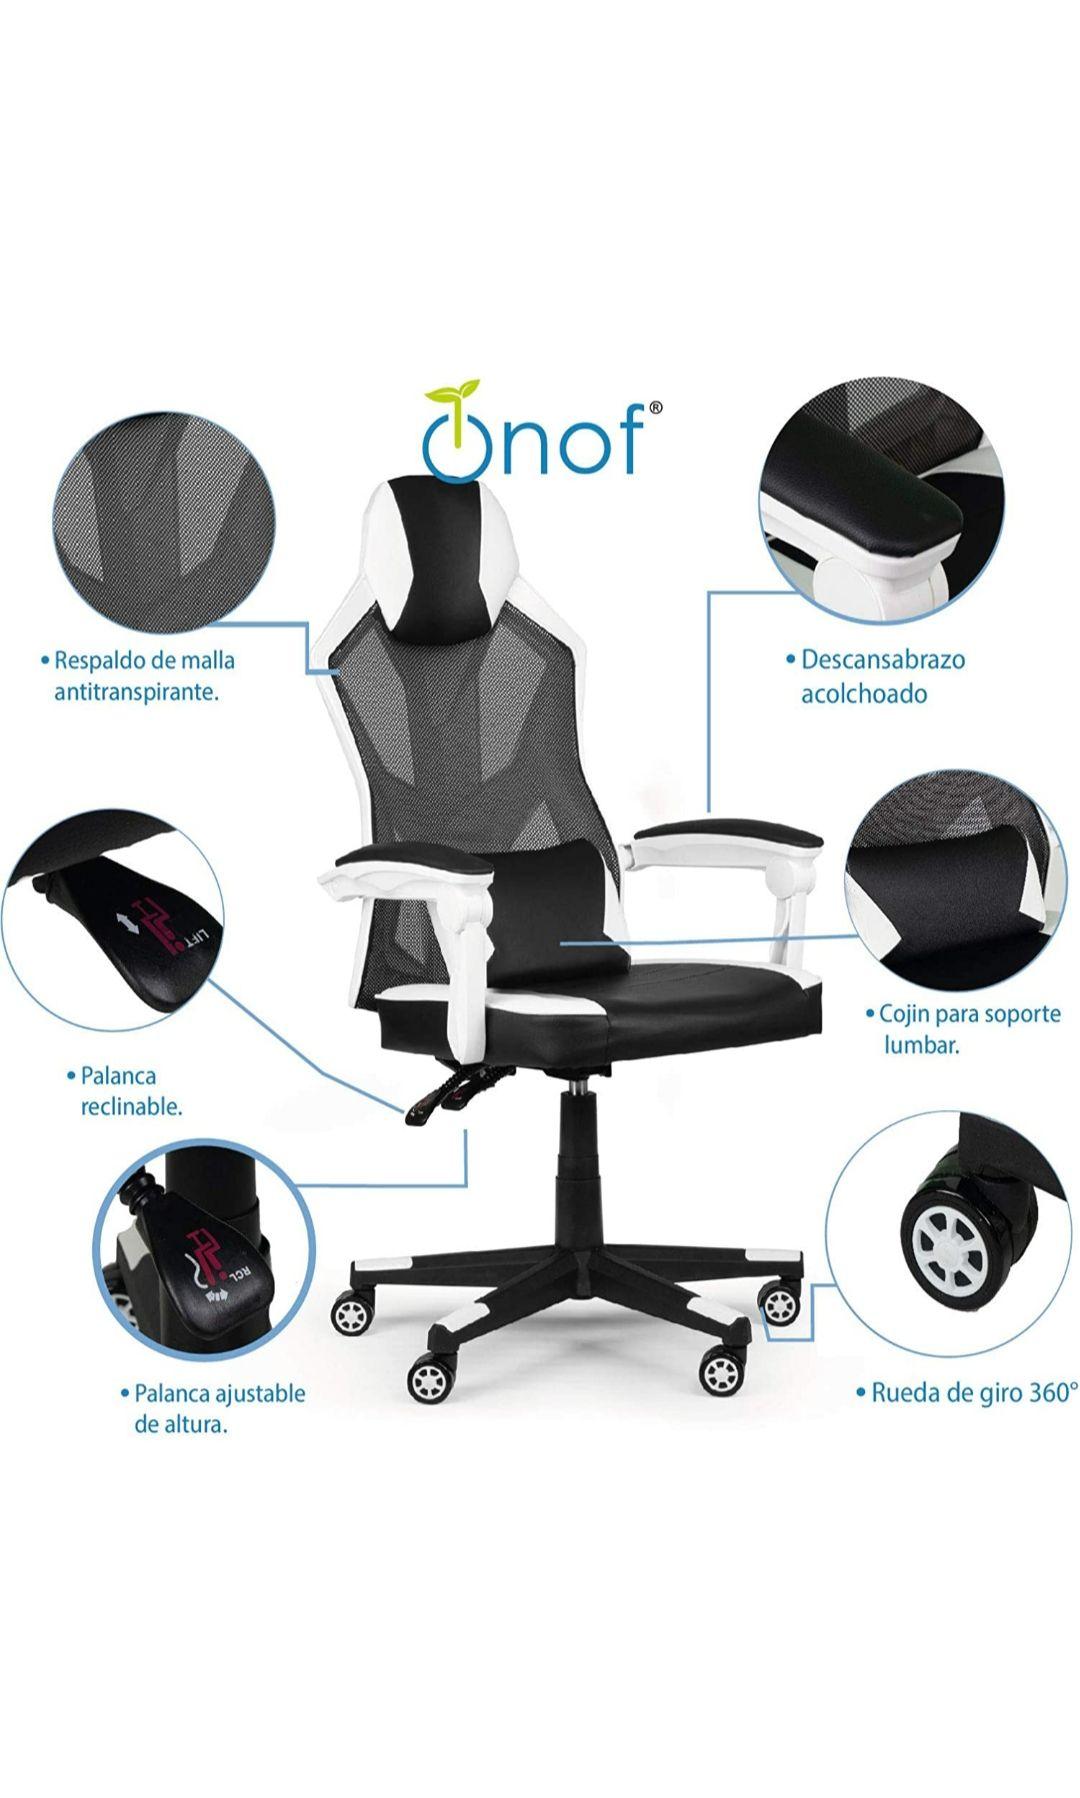 Amazon: Onof Silla Gamer PC Reclinable Soporte Lumbar Diseño Ergonomico